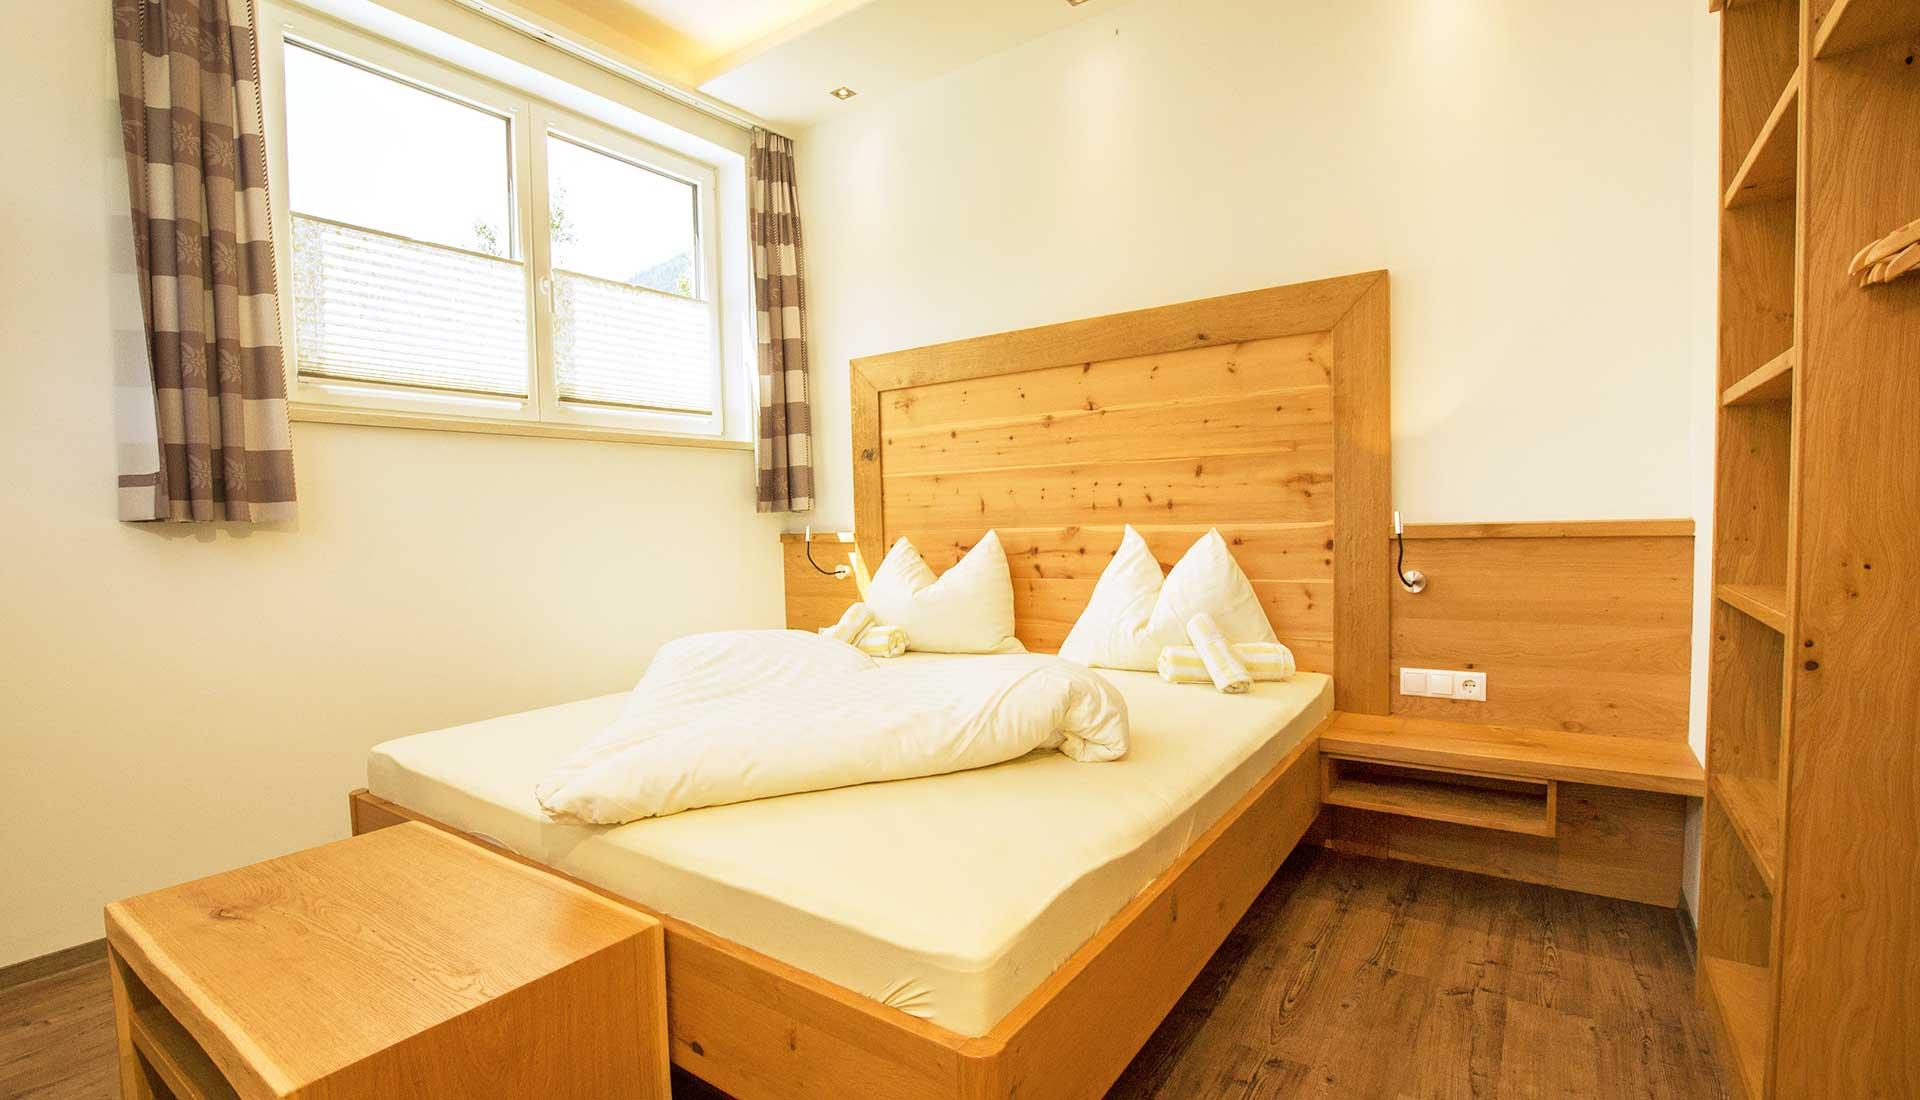 Apart-Hotel Panorama in Flachau, Salzburger Land - Sommerurlaub & Winterurlaub in Flachau, Salzburger Land, Ski amadé